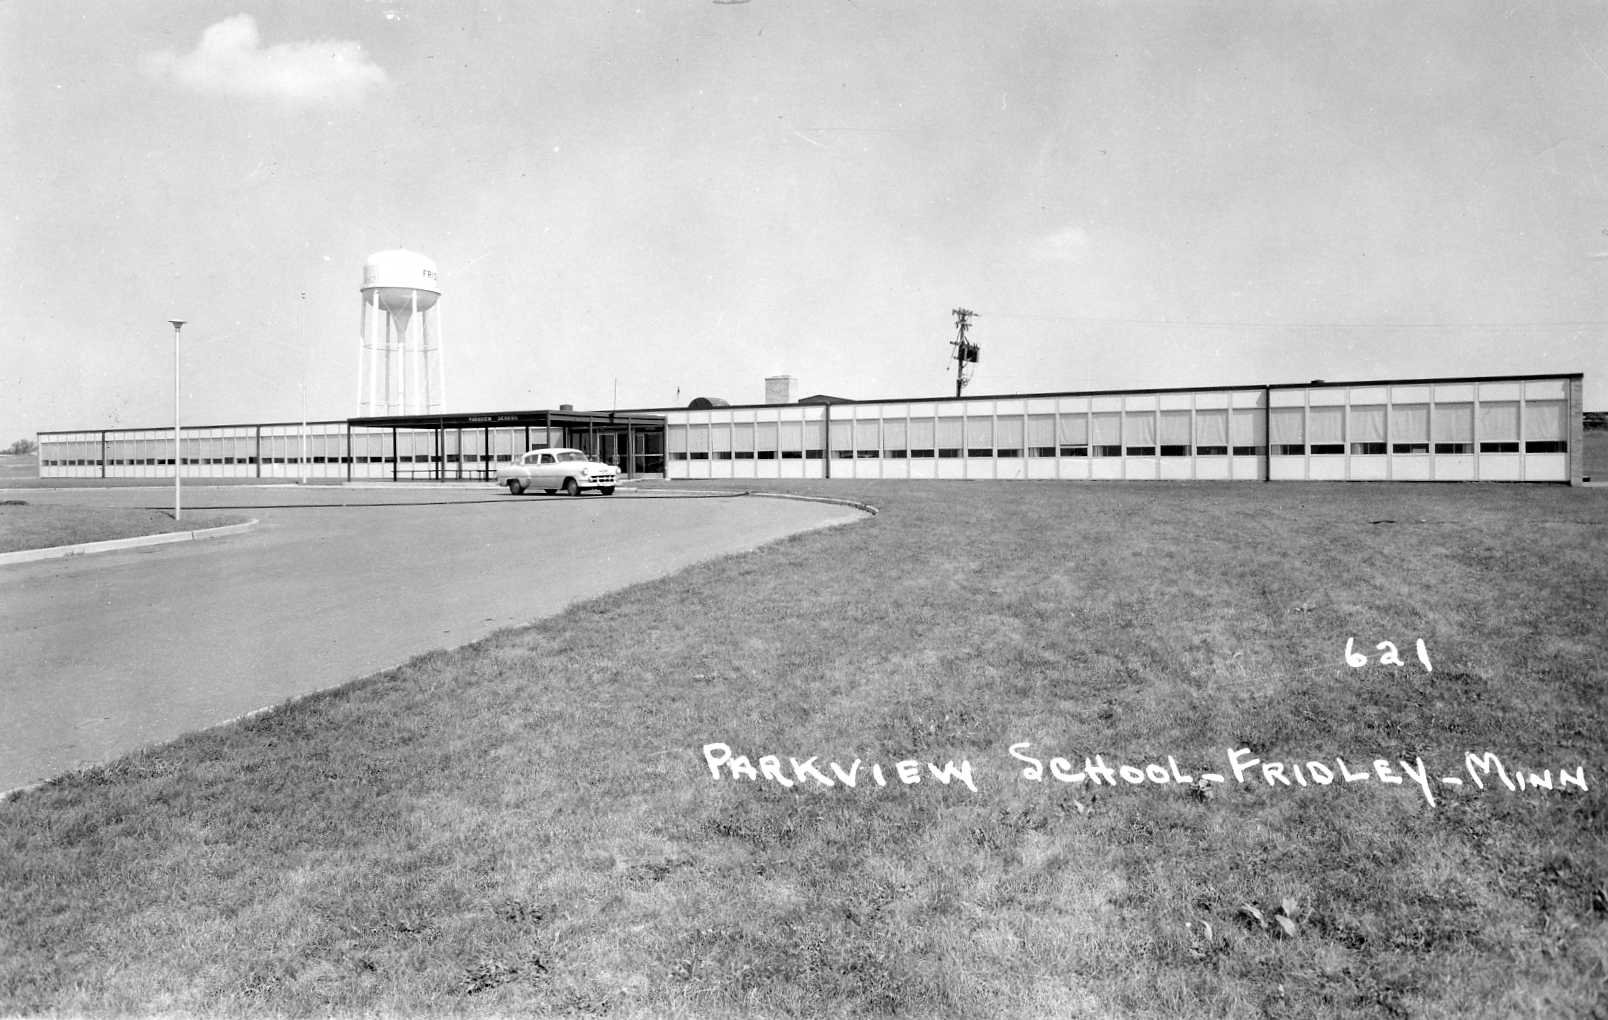 Parkview Elementary - Fridley, MN [c. 1957]